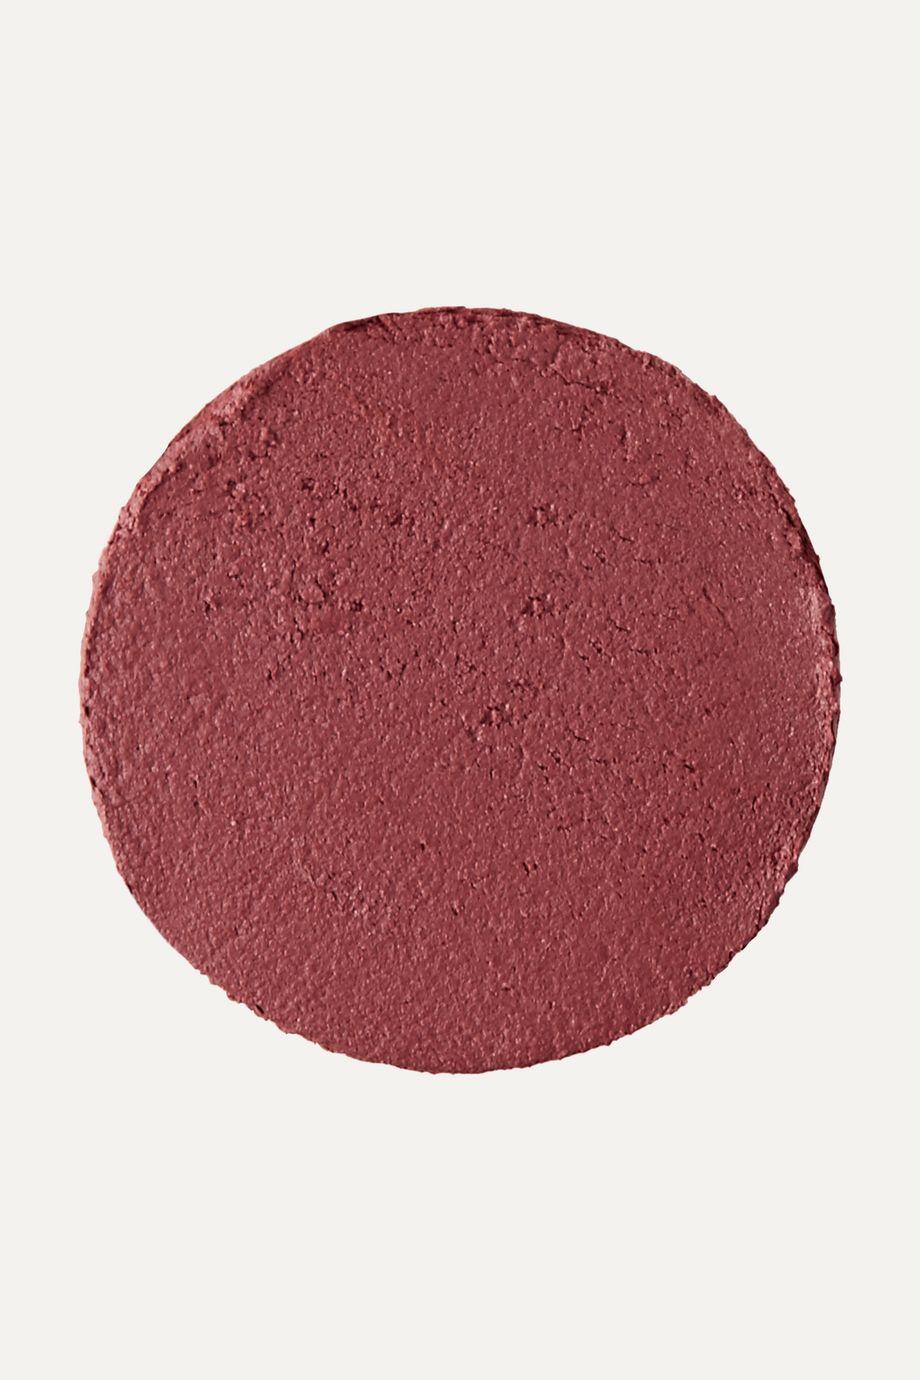 Illamasqua Antimatter Lipstick - Meteor